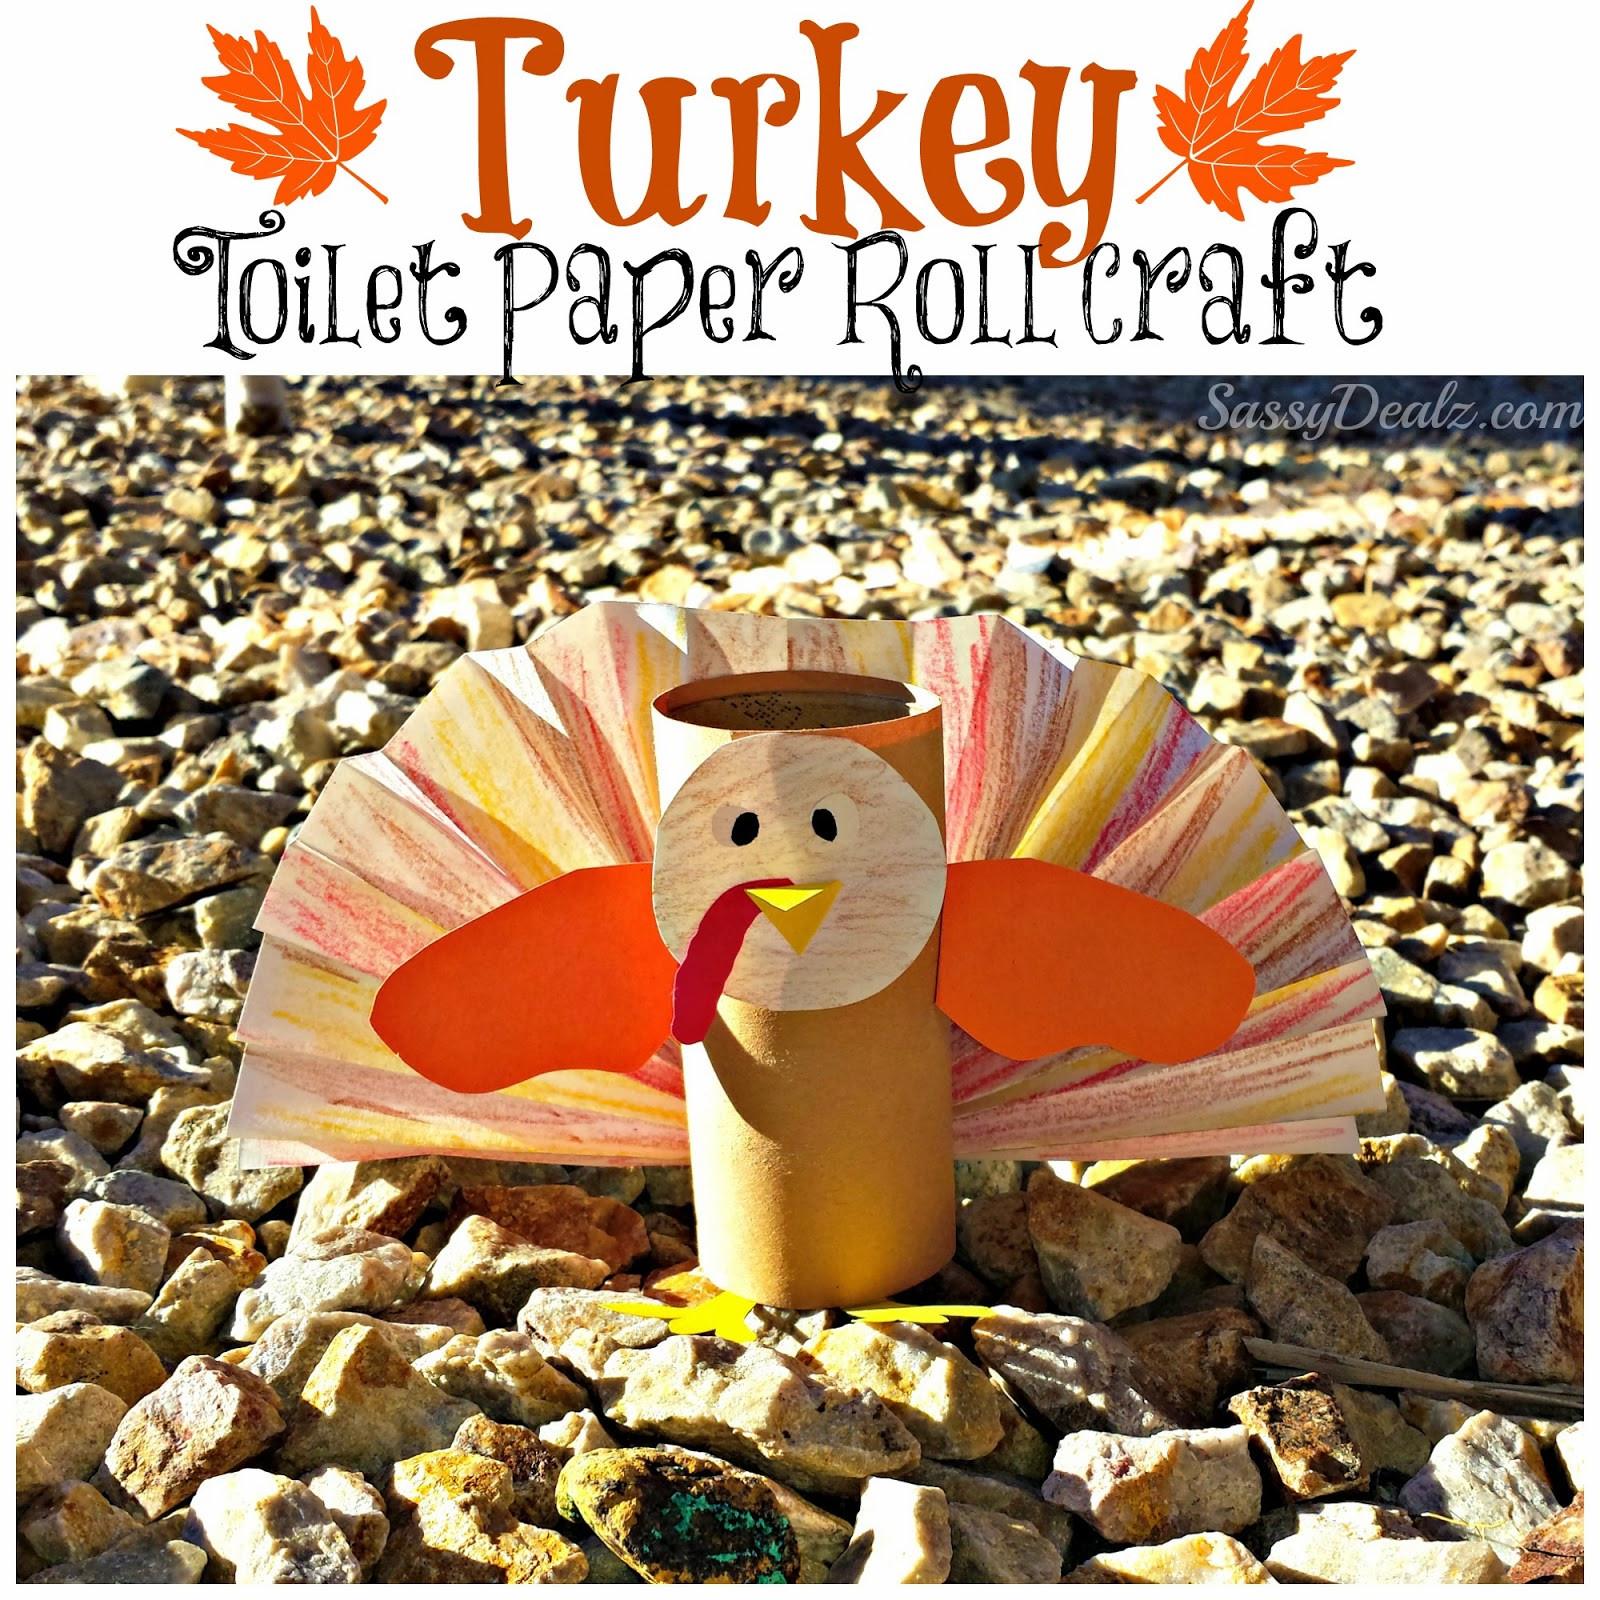 Toilet Paper Roll Thanksgiving Crafts  Turkey Toilet Paper Roll Craft For Kids Thanksgiving Art